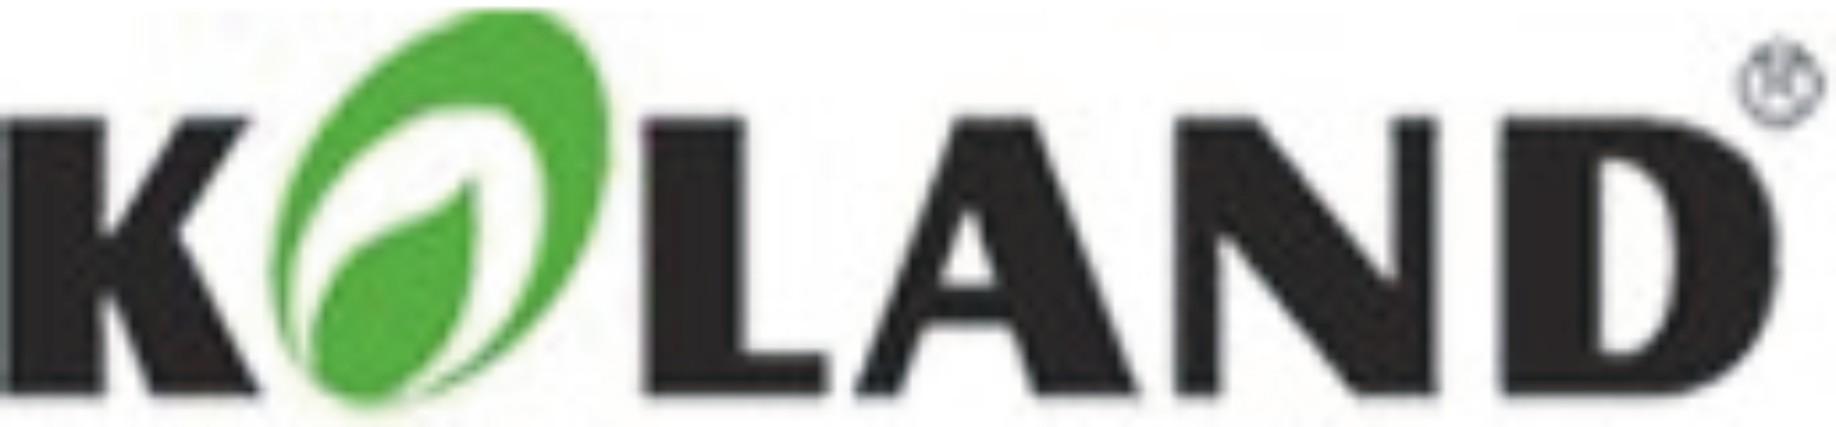 Koland Energy Science  Tech Co., Ltd